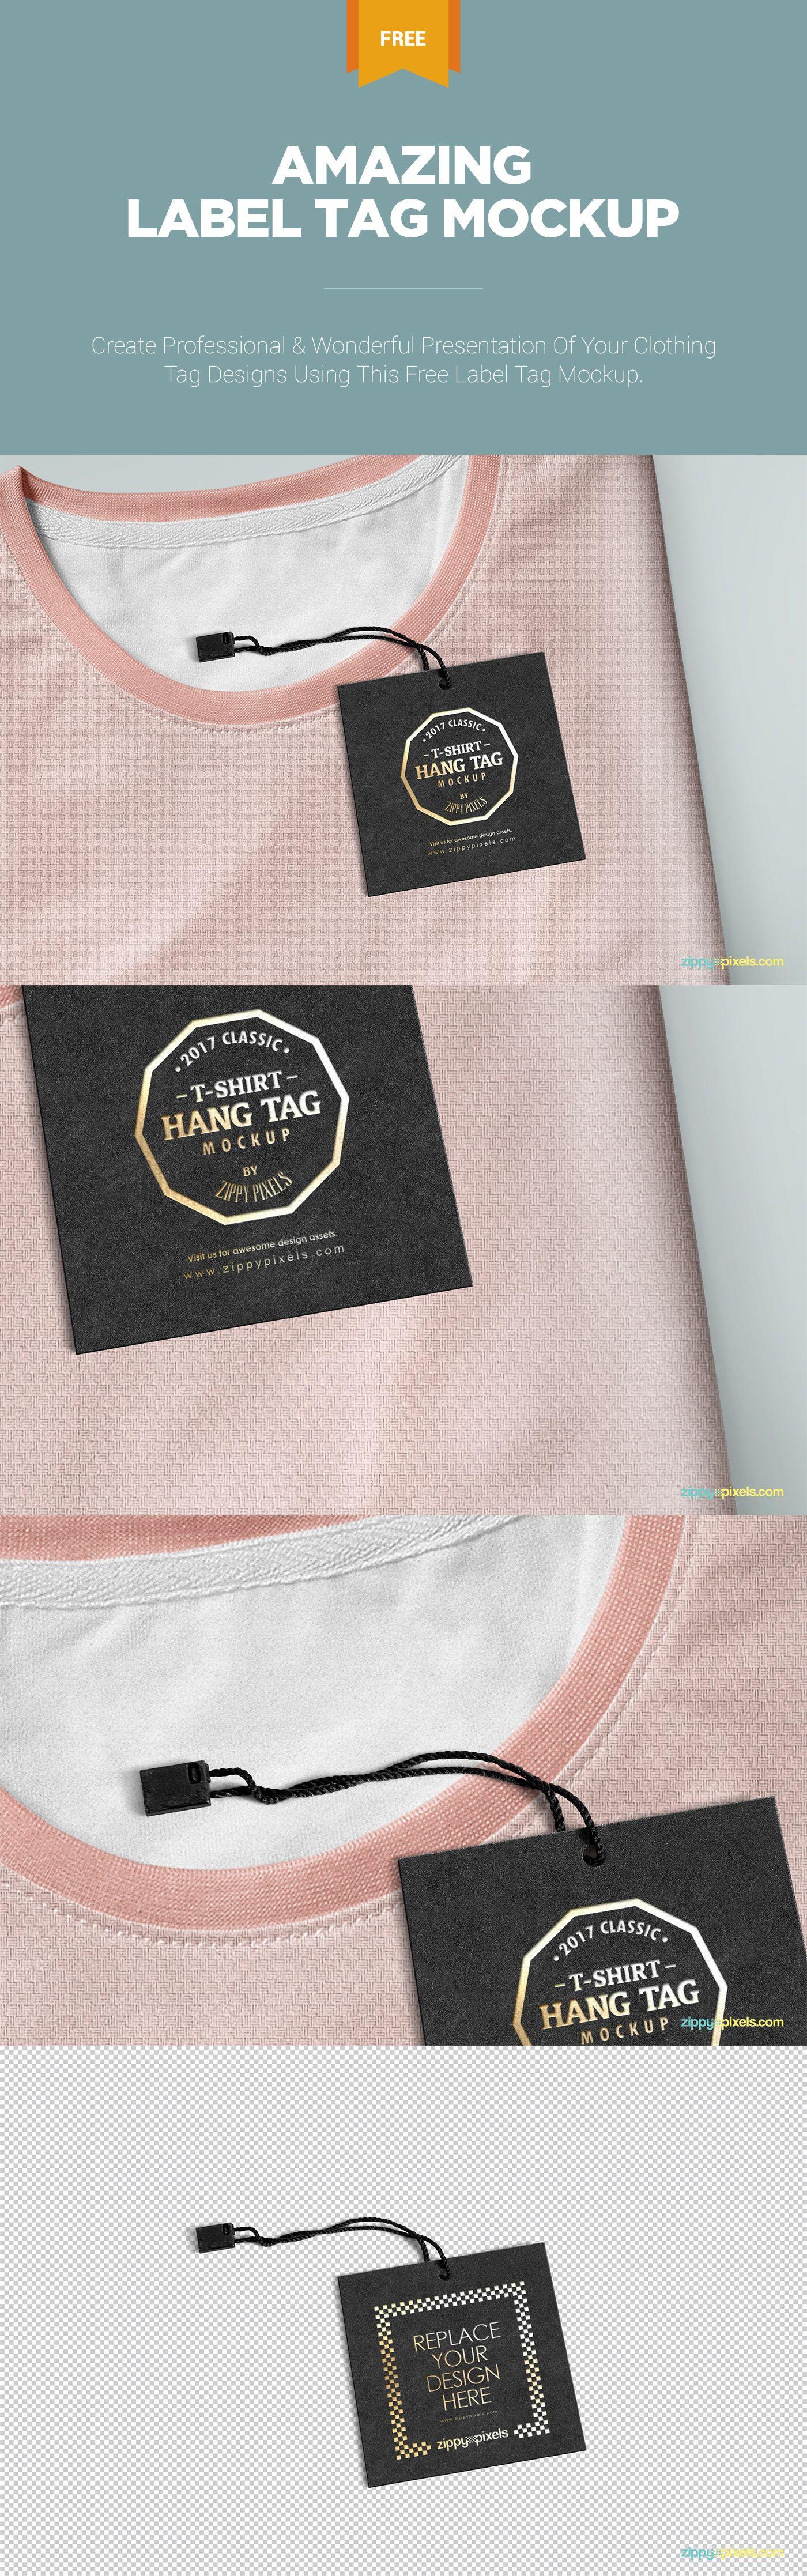 Download Classy Label Tag Mockup Freebie Zippypixels Clothing Mockup Label Tag Tshirt Designs